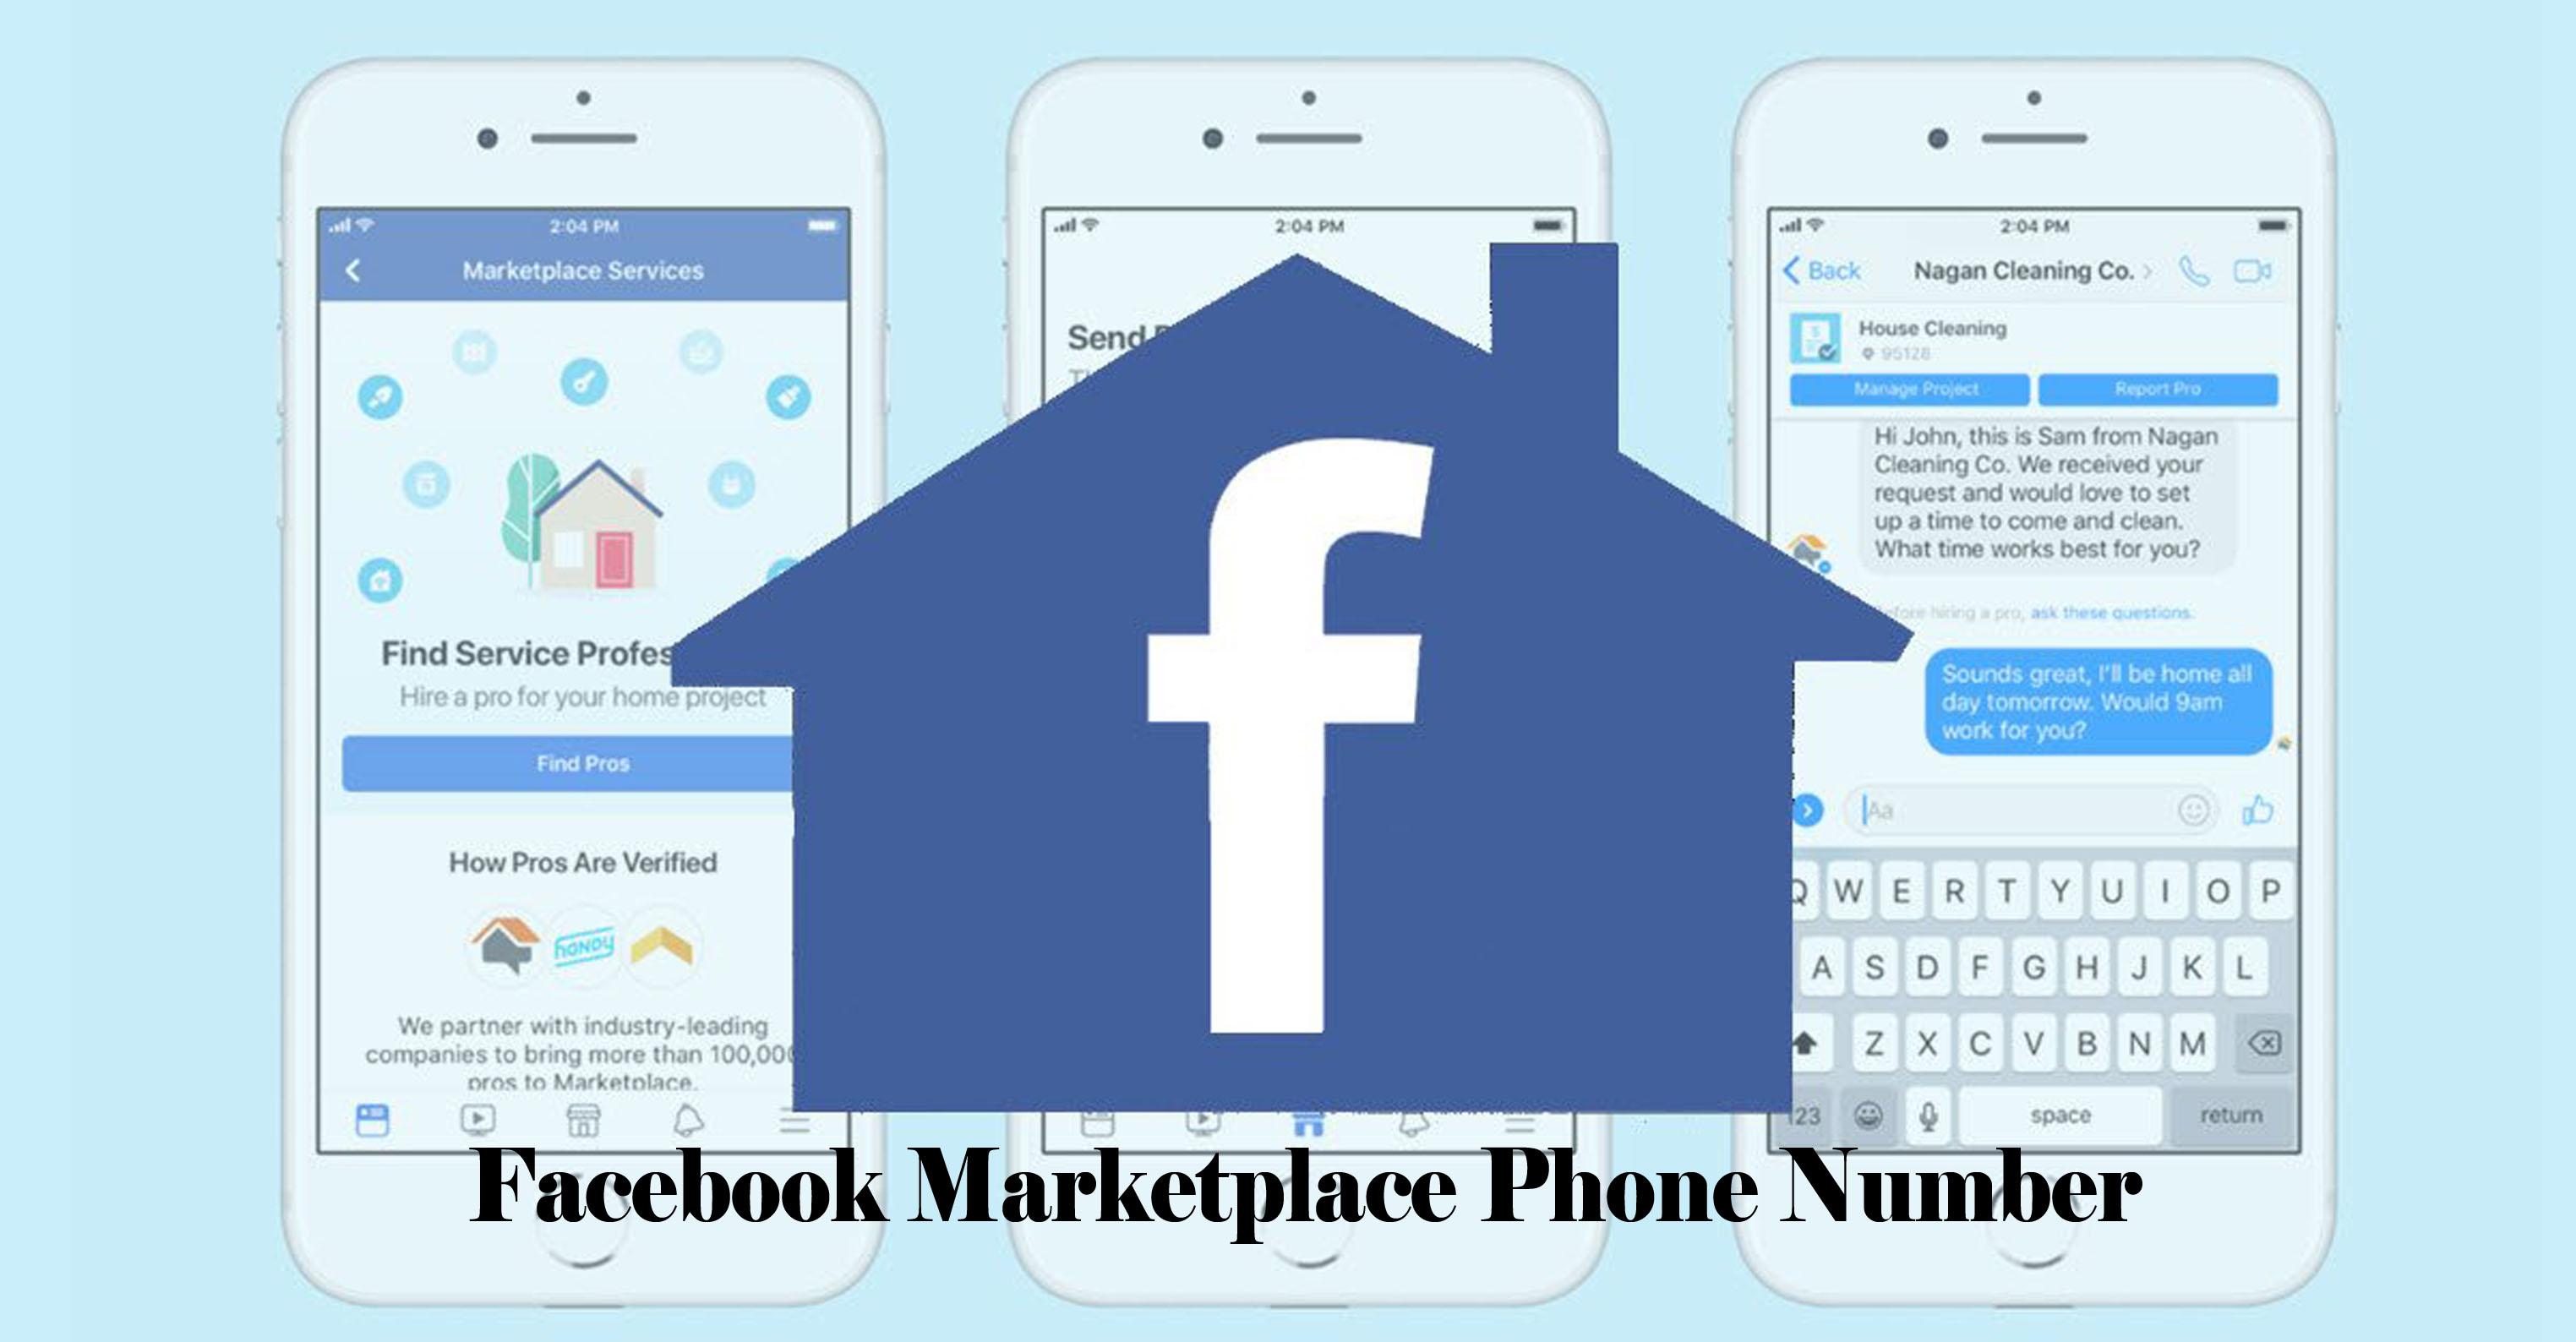 Facebook Marketplace Phone Number - The Facebook Marketplace